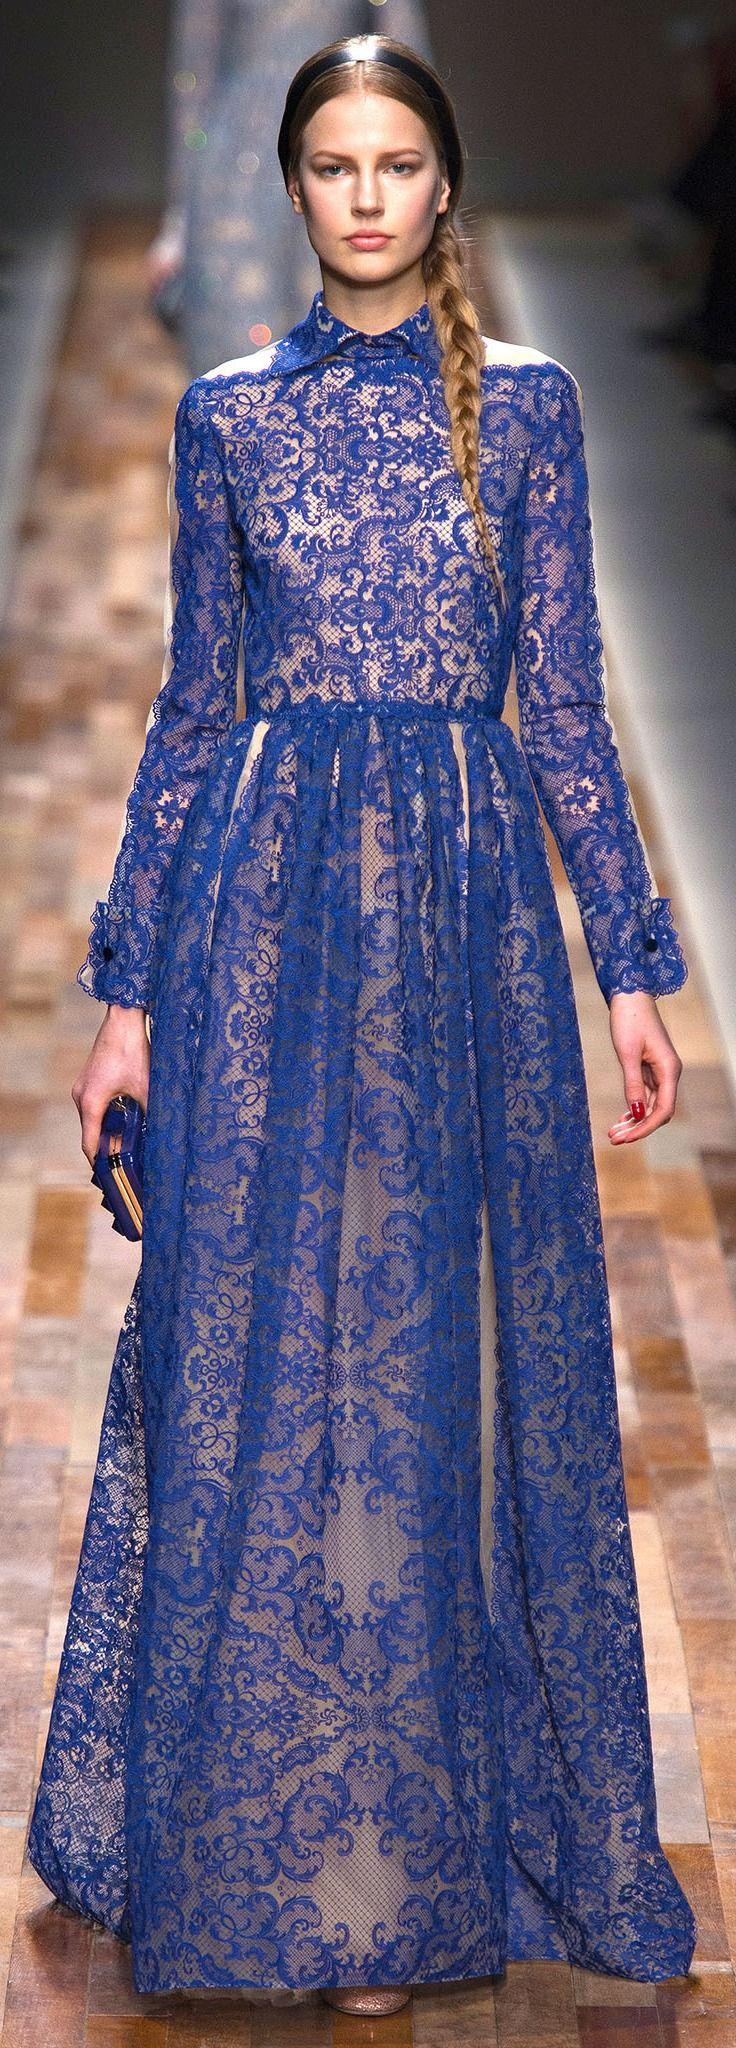 Fall 2013 Ready-to-Wear Valentino